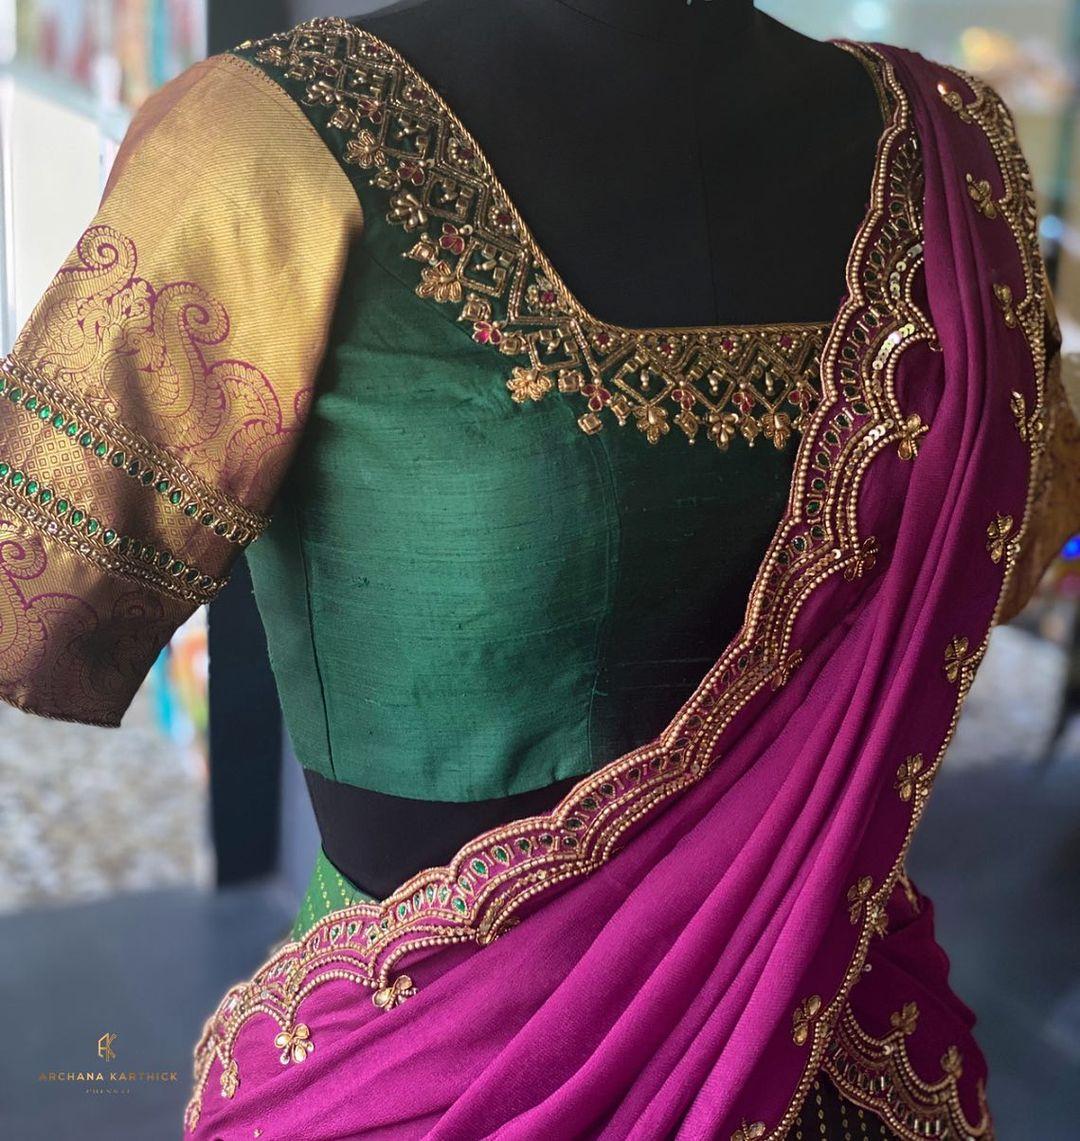 Gorgeous bottle green color bridal blouse with zardosi work. 2021-10-09